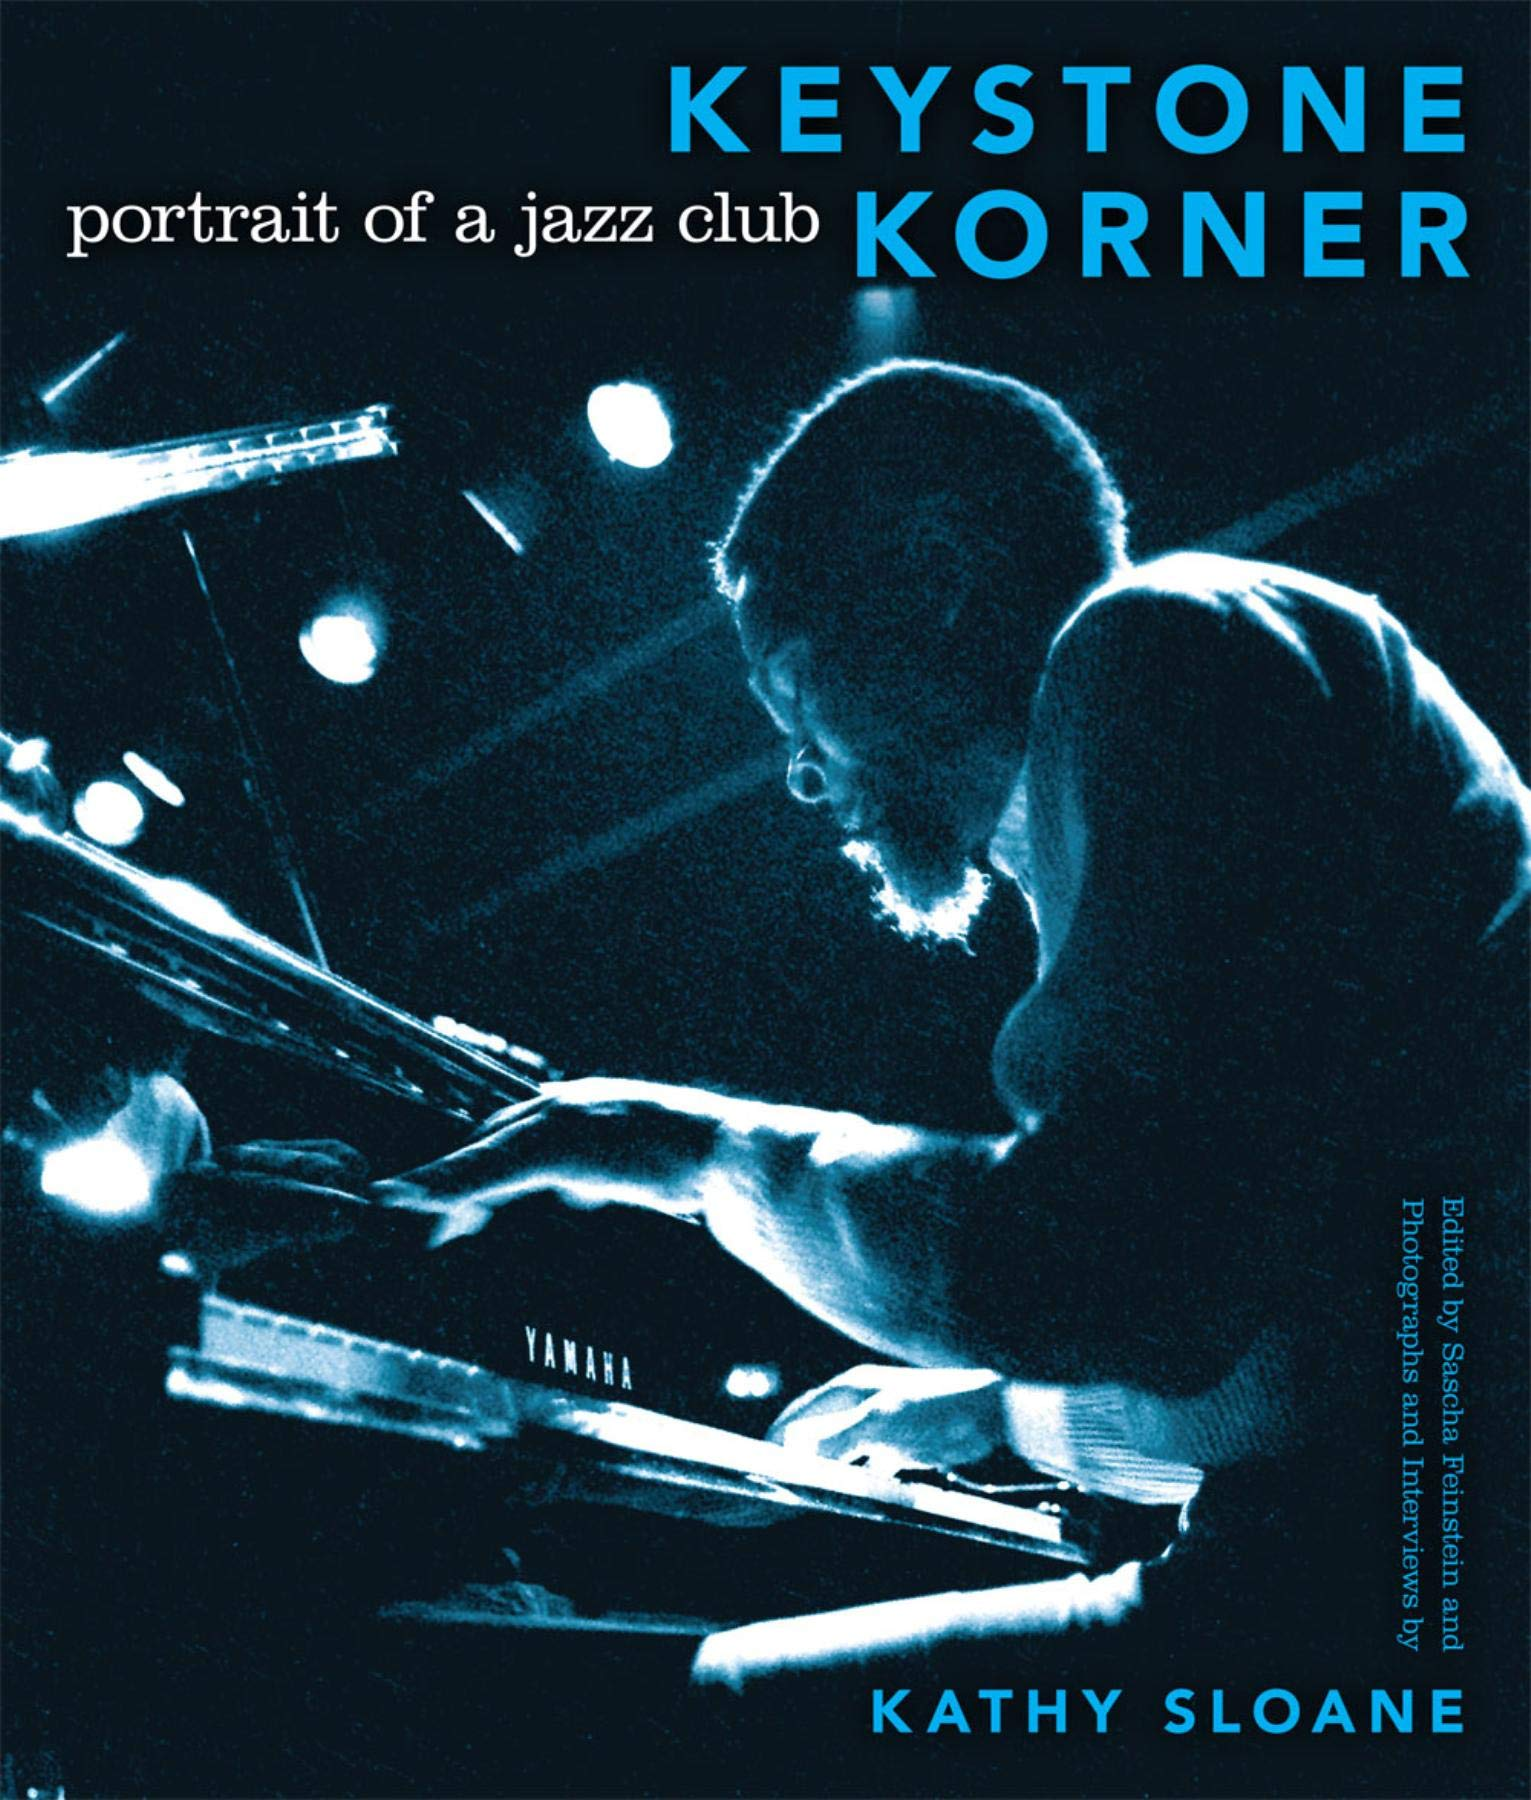 Keystone Korner: Portrait of a Jazz Club: Kathy Sloane